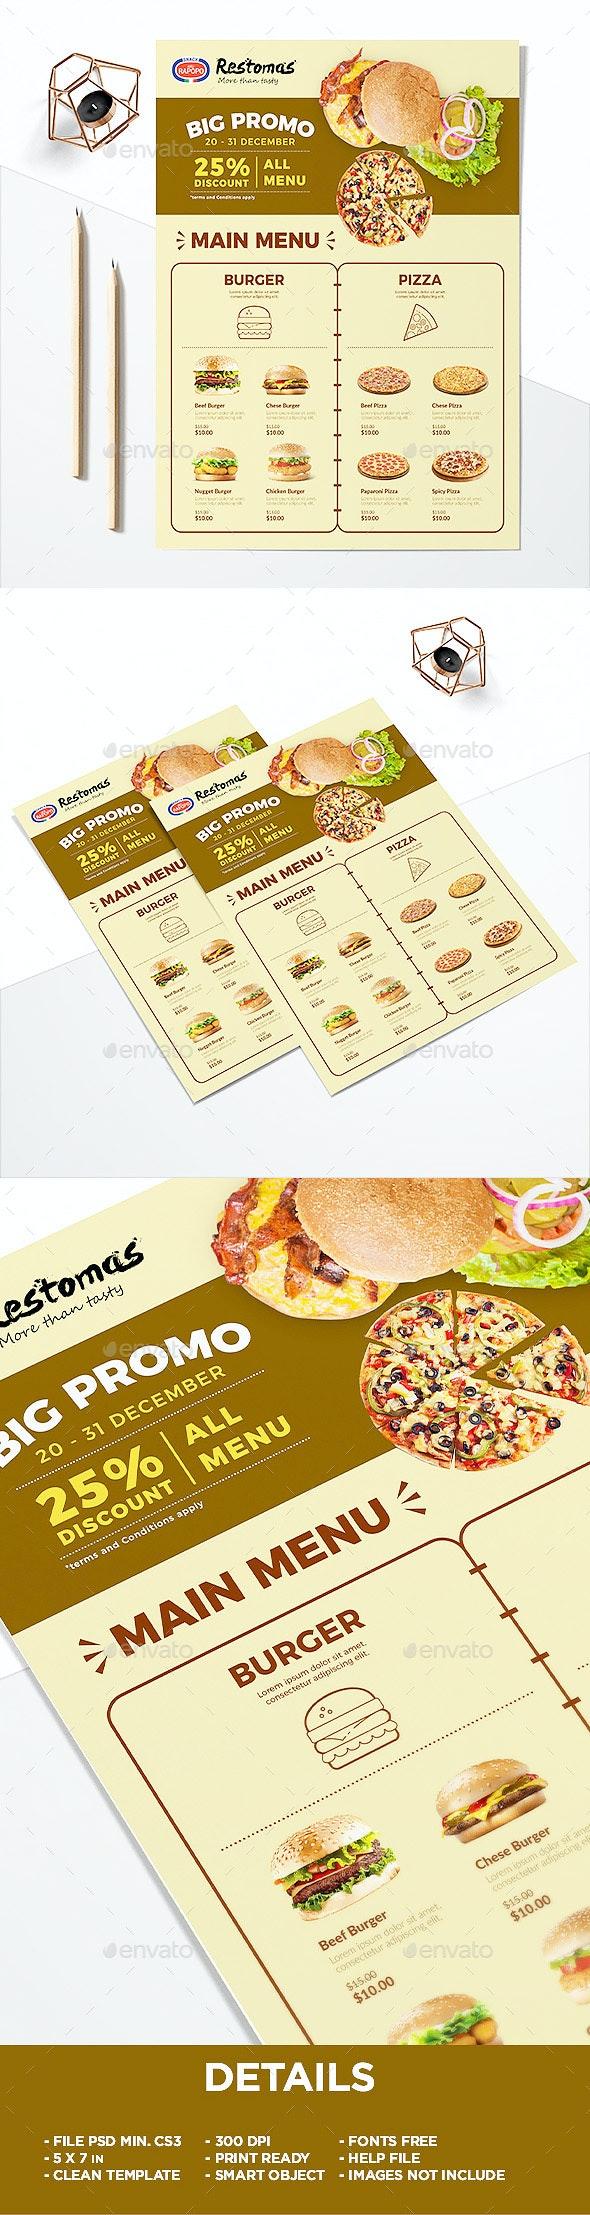 Minimalist Restaurant Menu - Food Menu Flyer - Restaurant Flyers